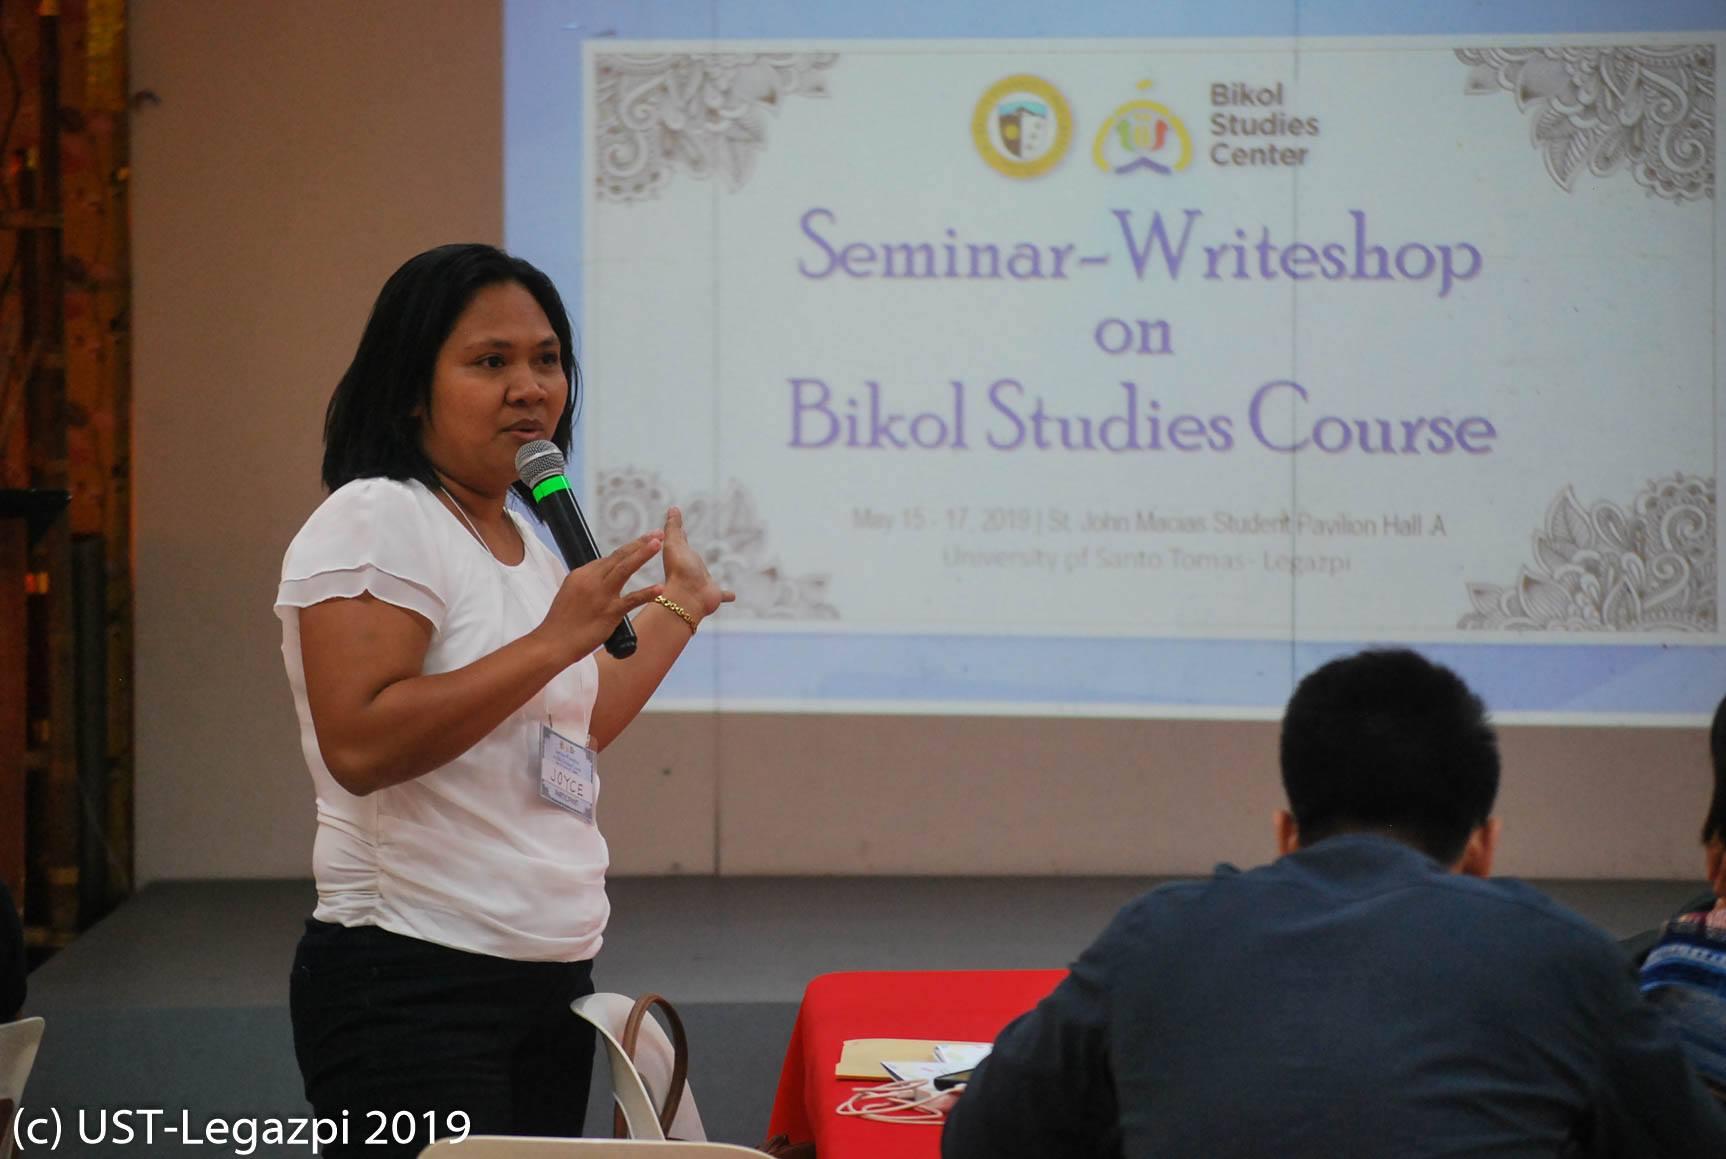 Bikol Studies Center Seminar-Writeshop on Bikol Studies Course